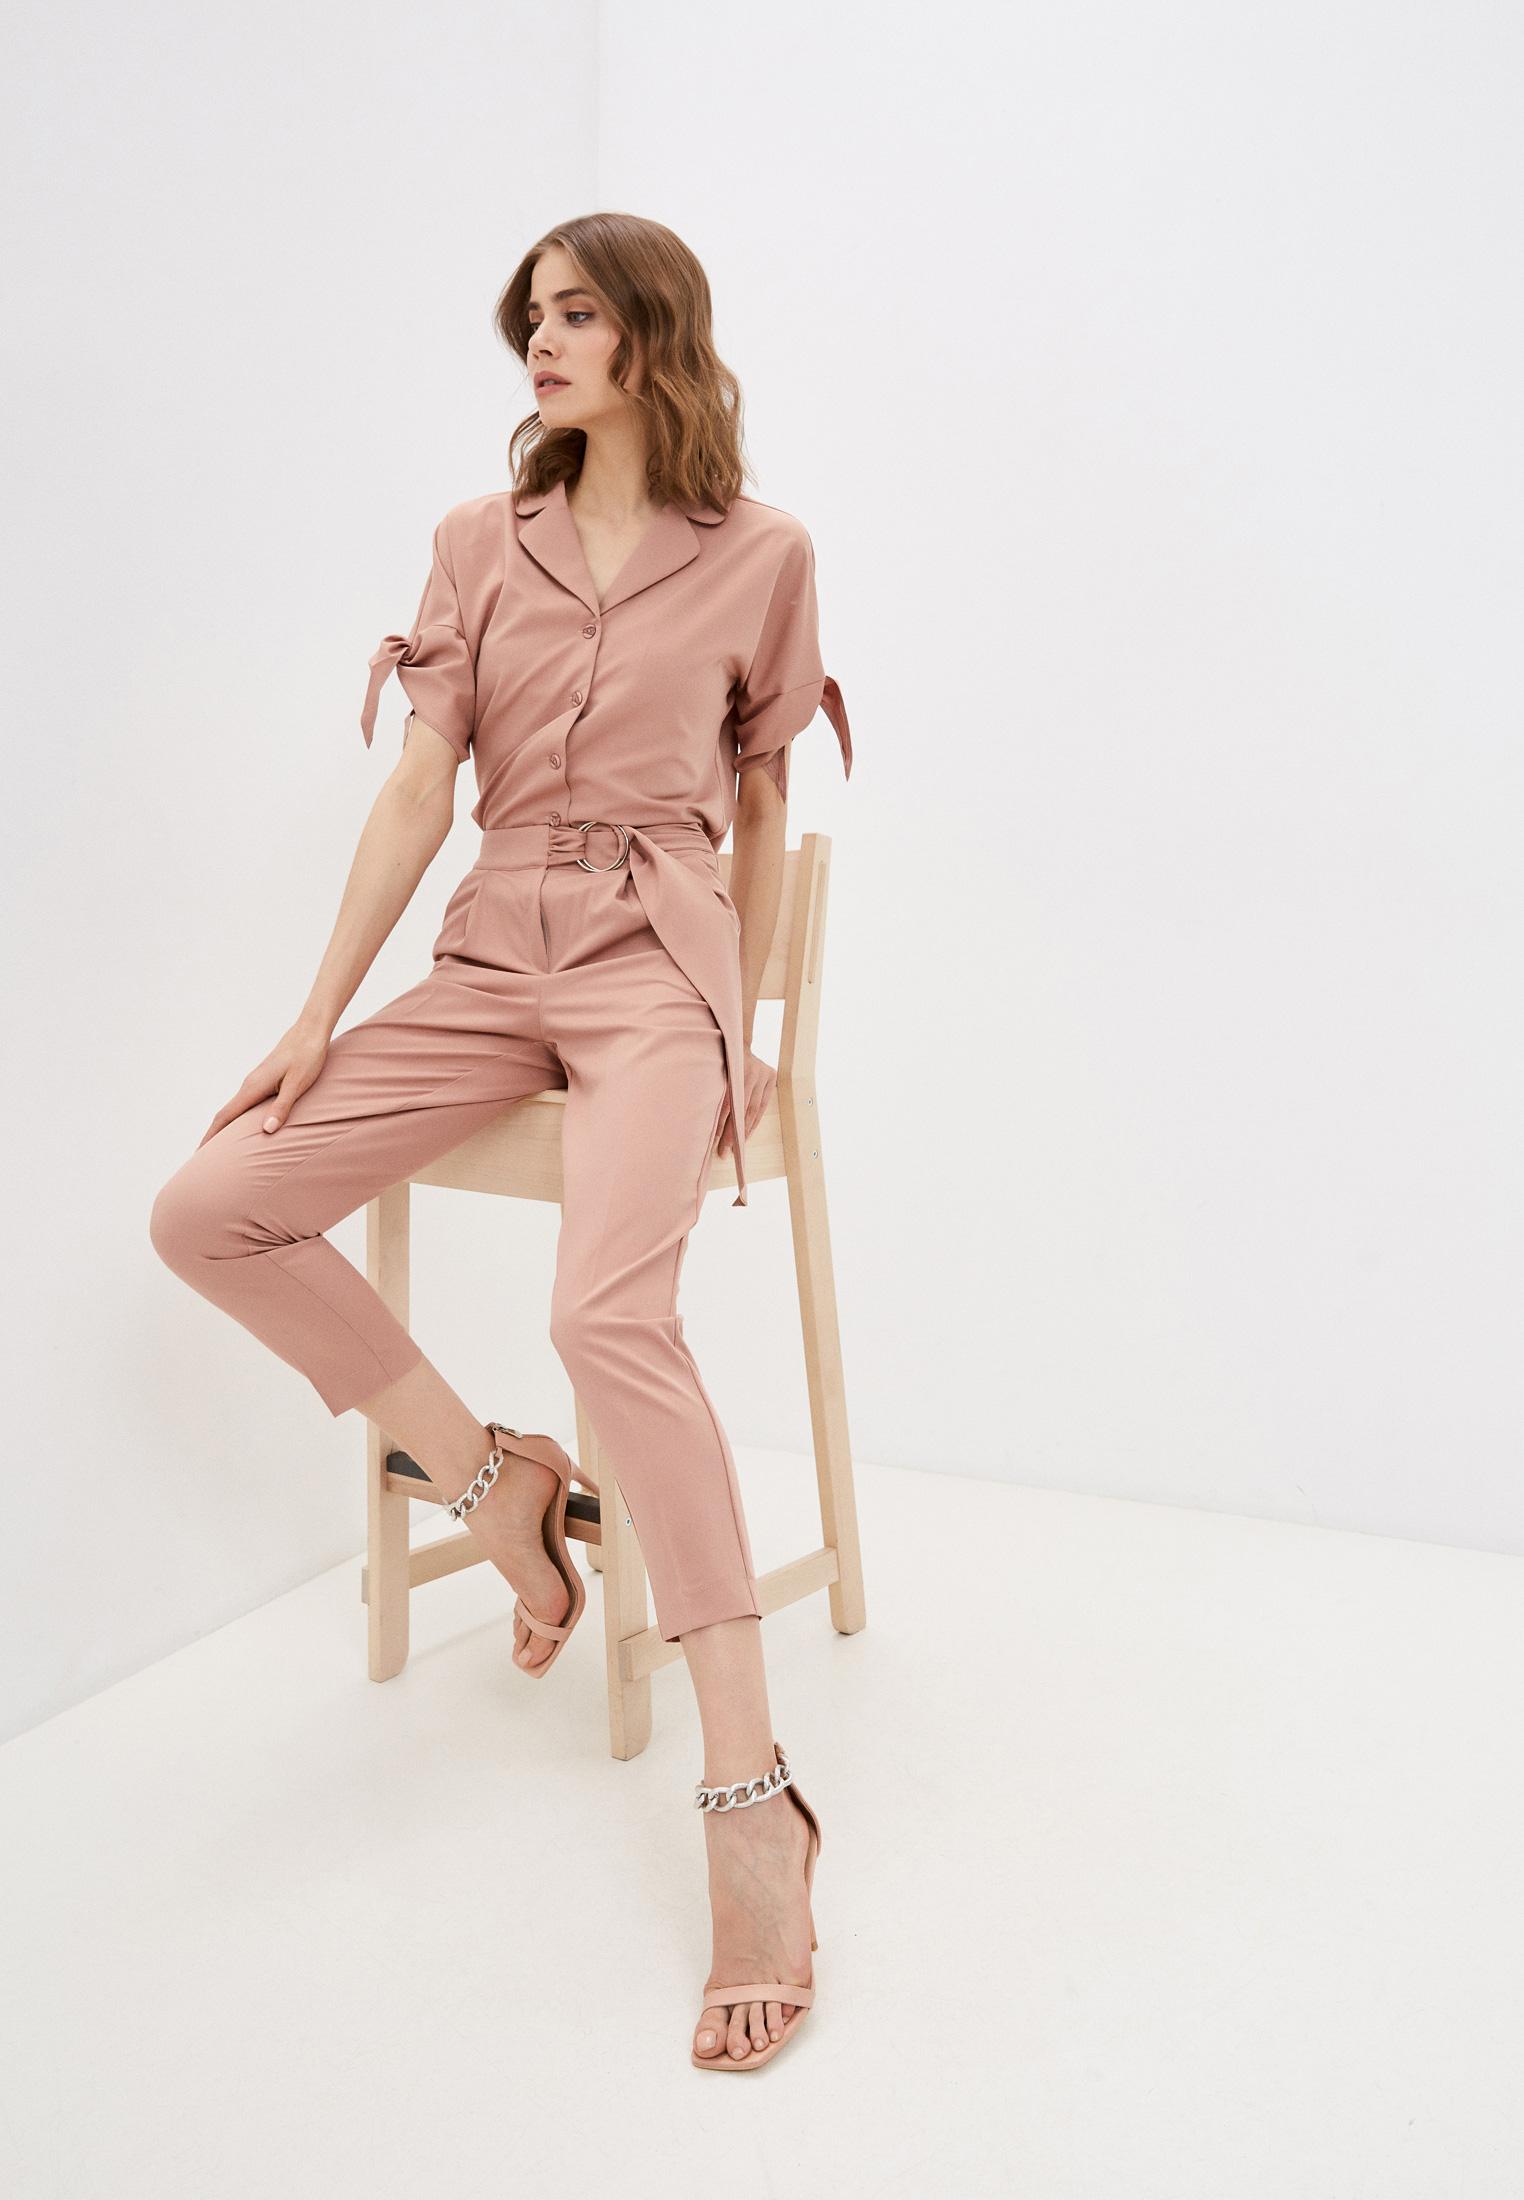 Костюм с брюками Pink Orange PO21-031340-2